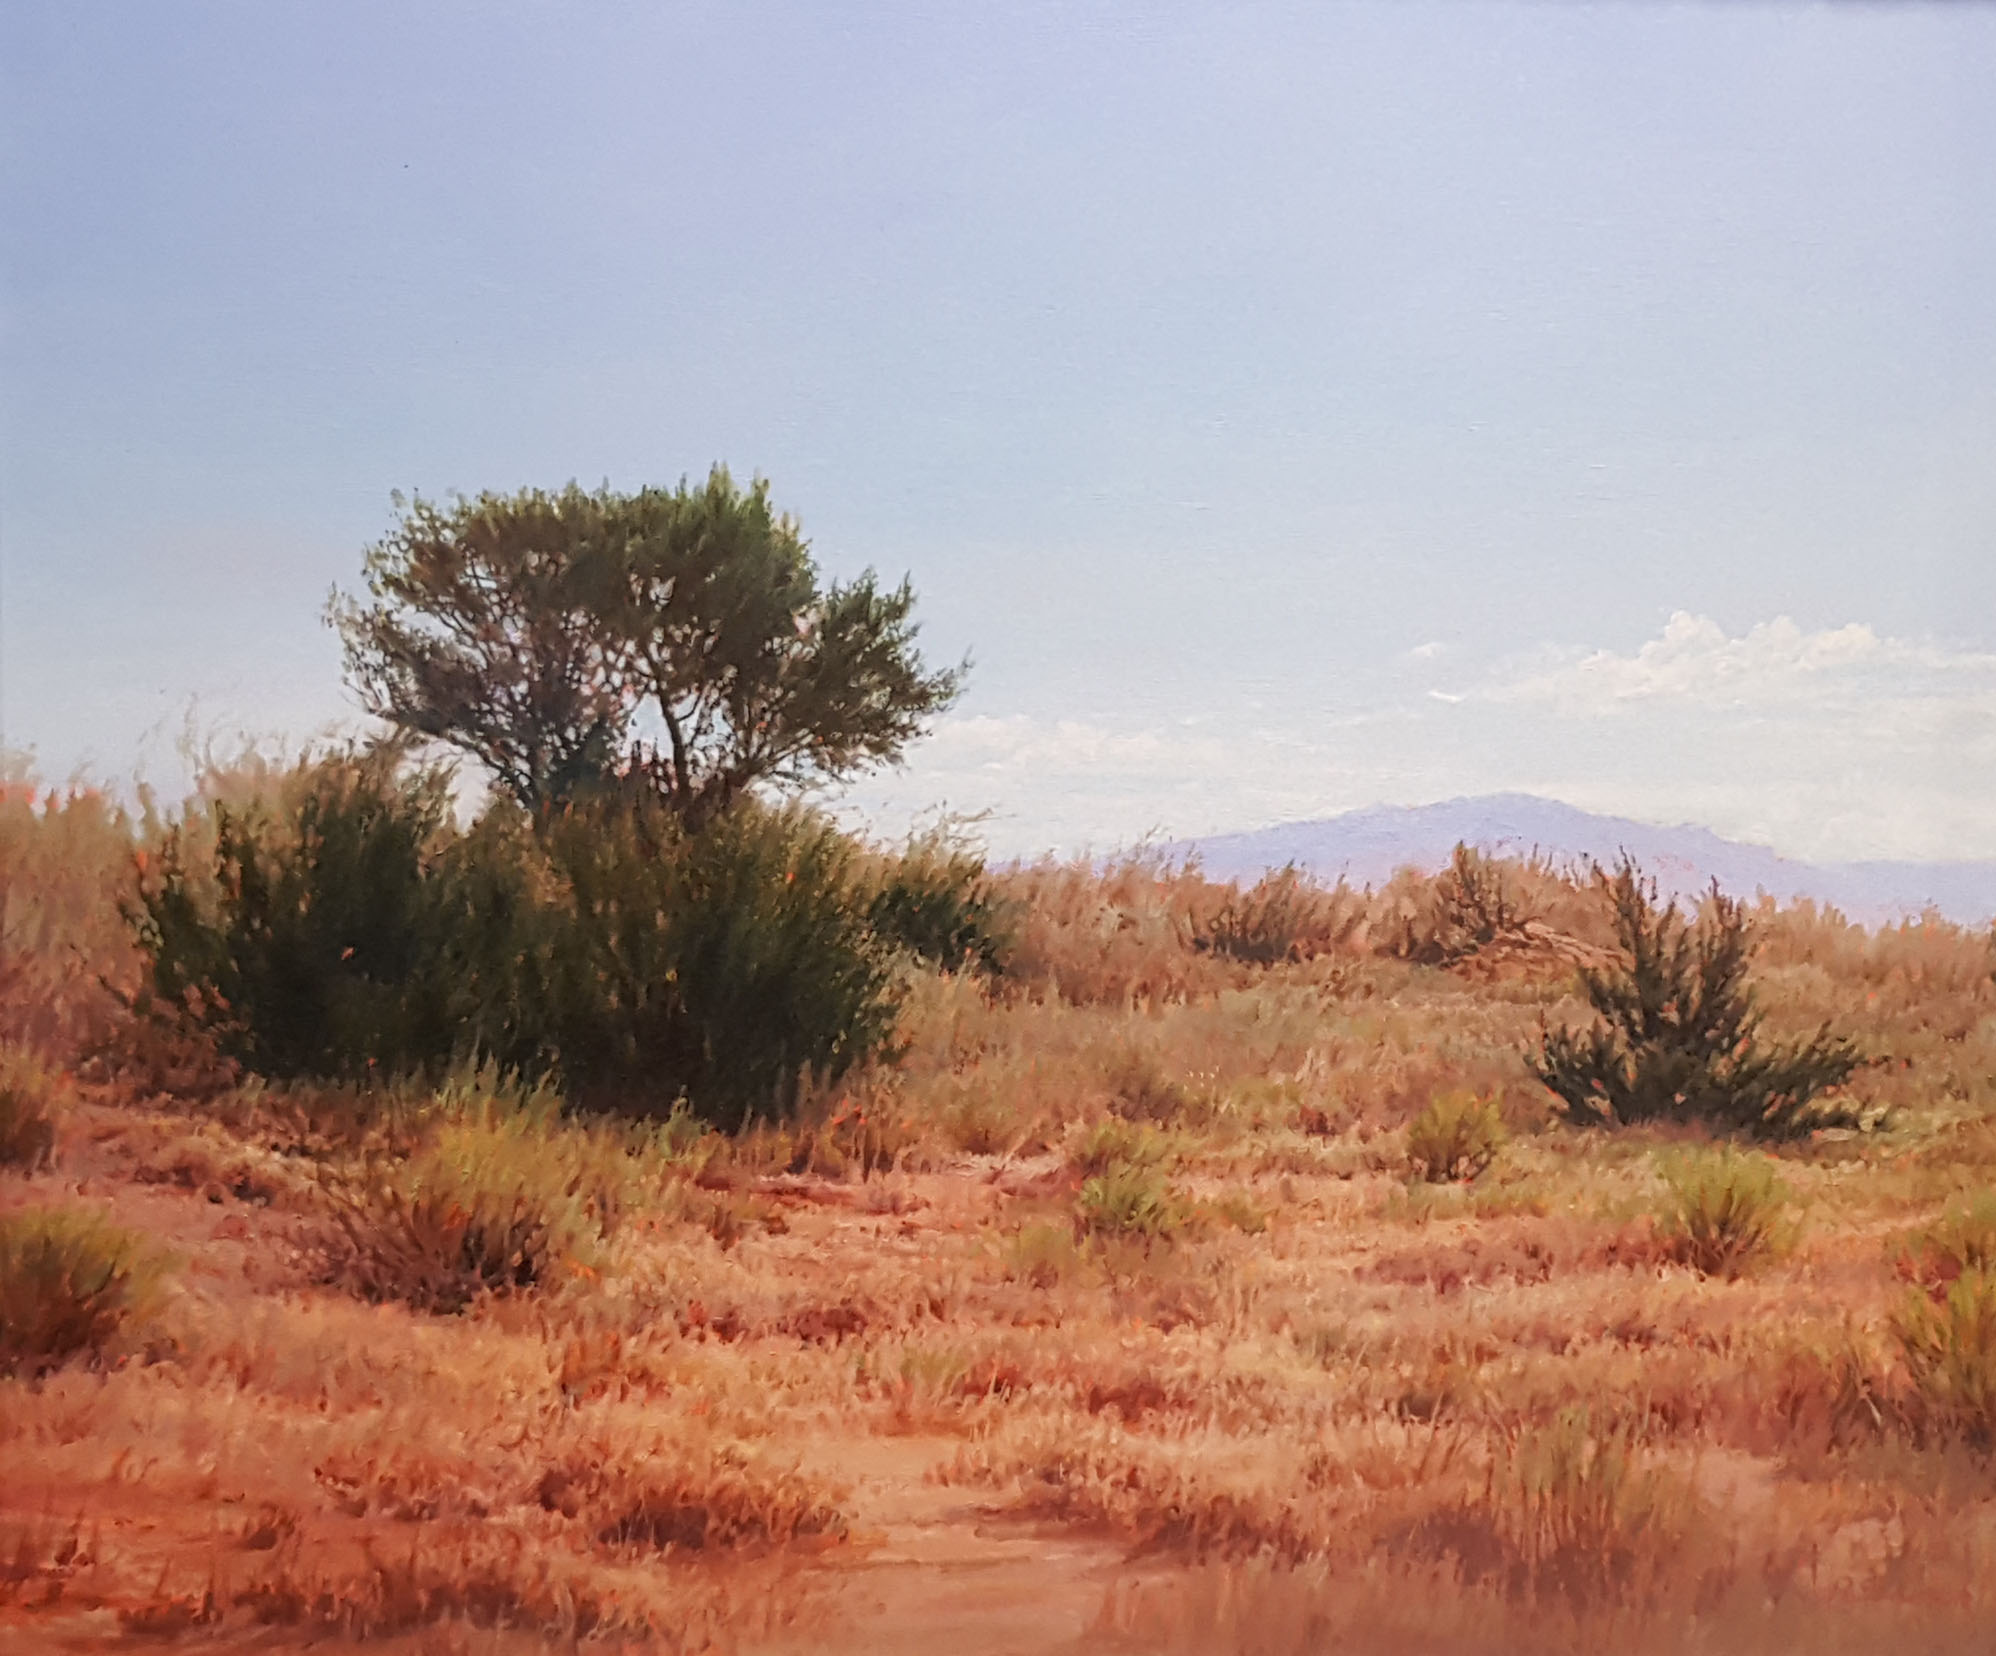 """Distant Sandia"" by Richard Sedlack"